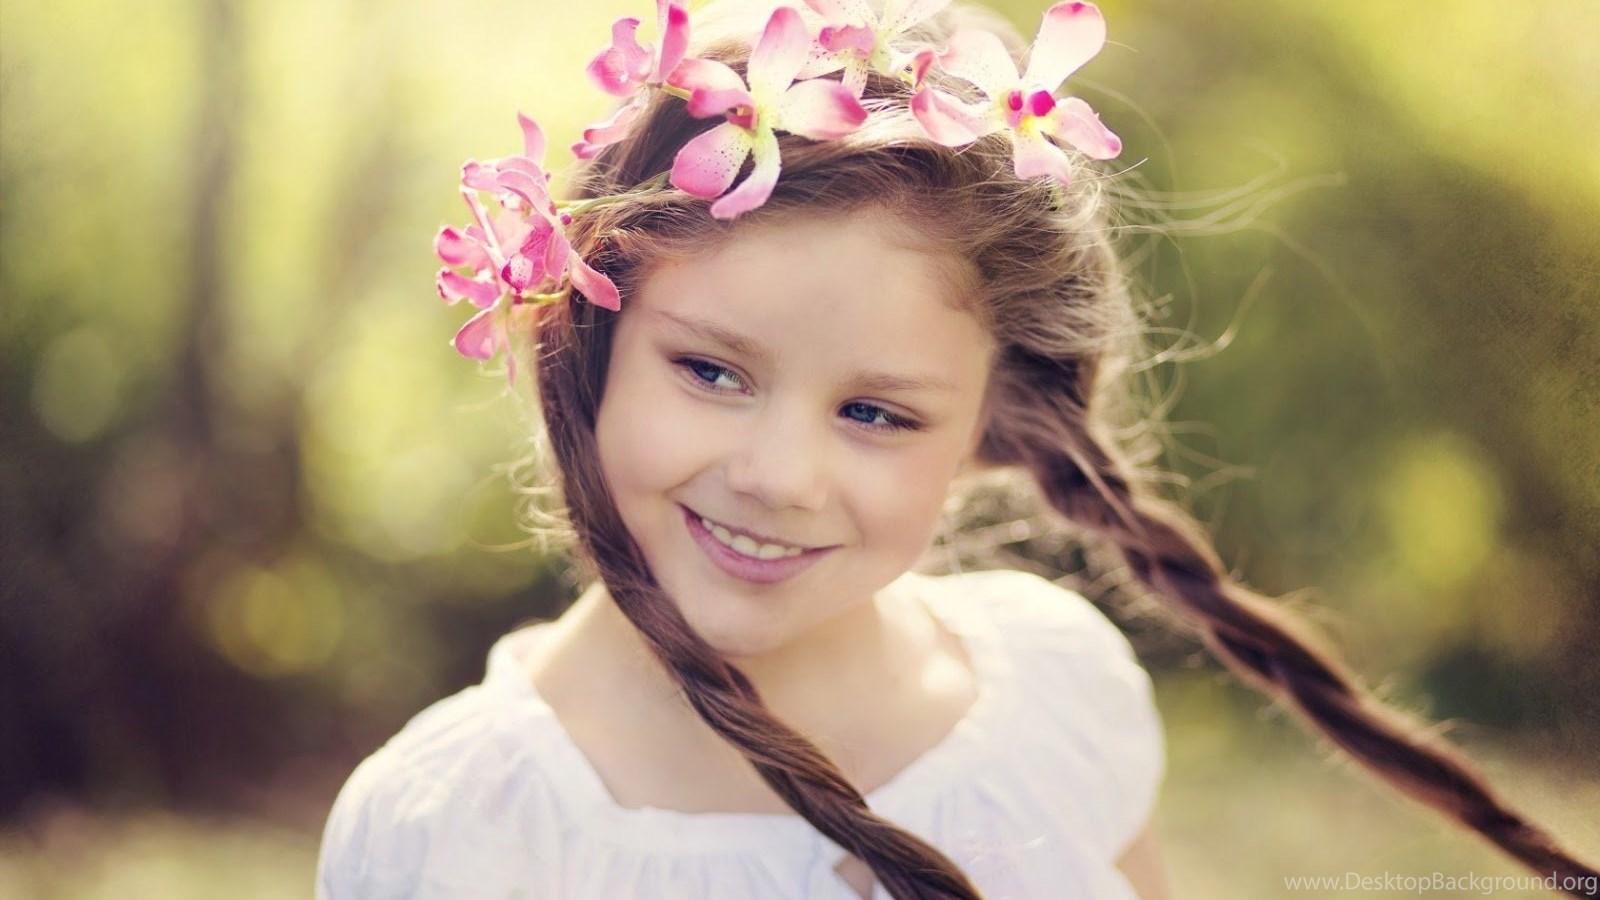 hd wallpapers: cute girls smile wallpapers desktop background